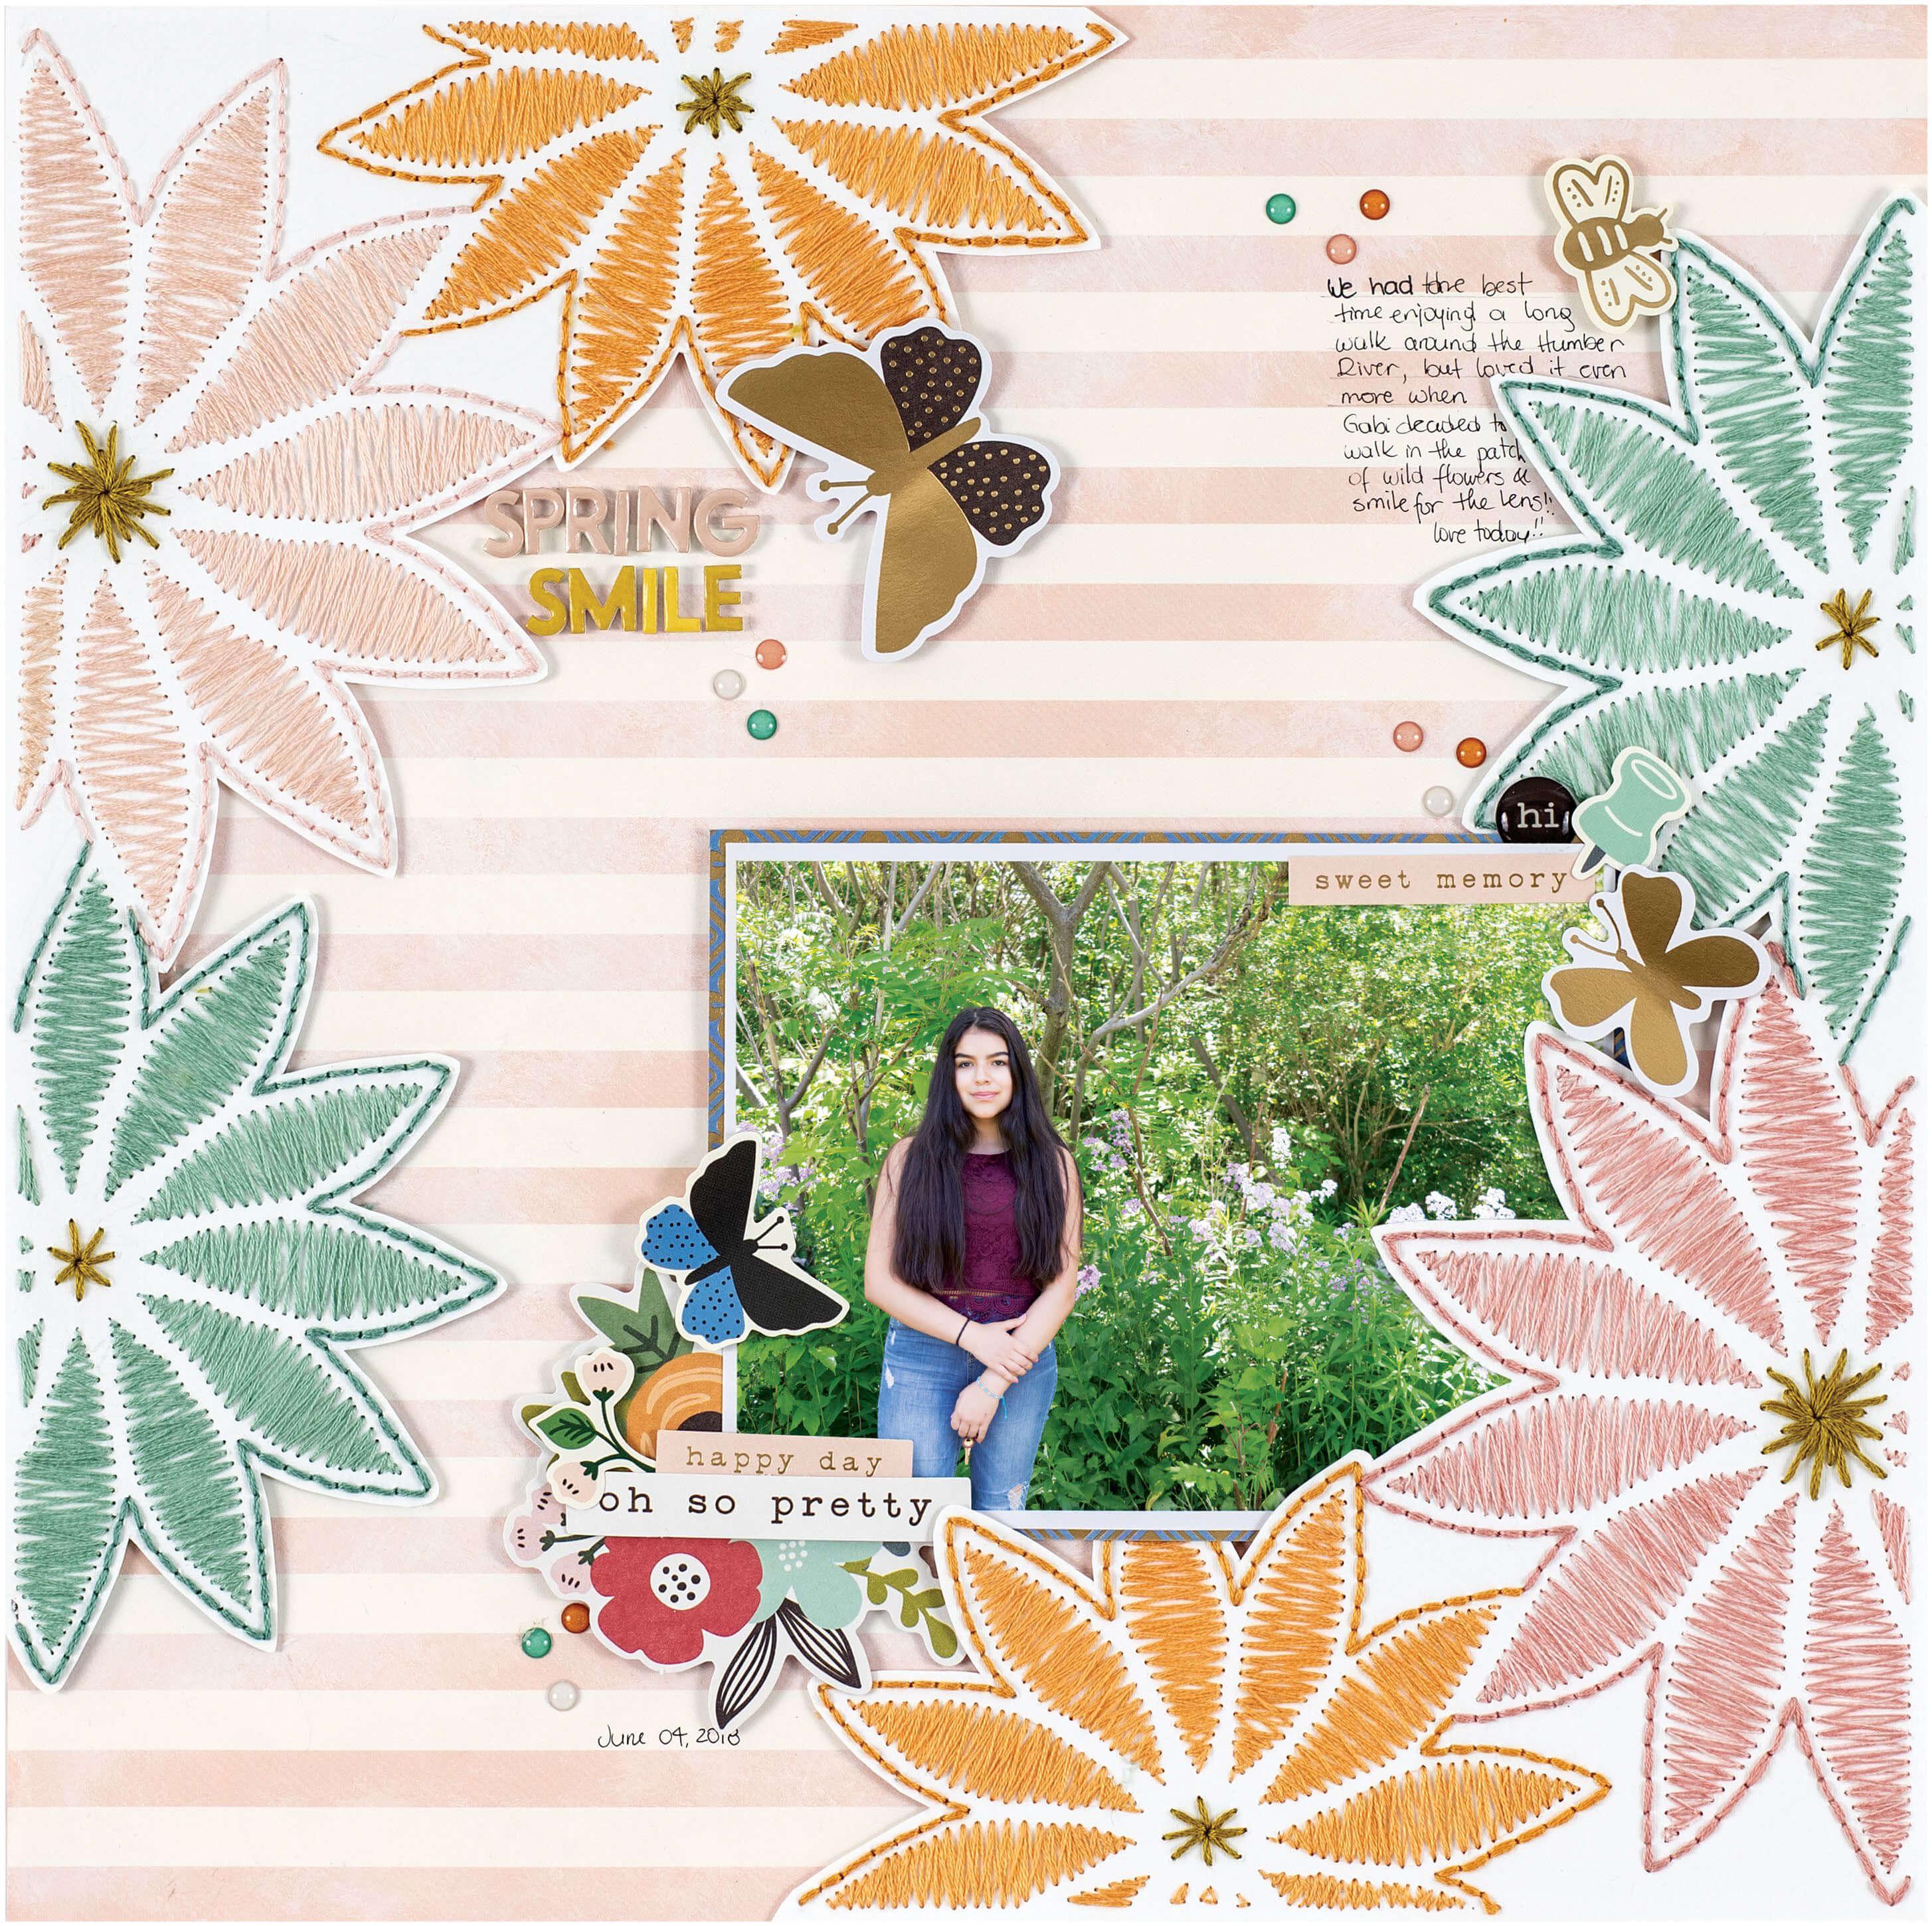 SCT Spring 2019 - Spring Smile by Nathalie DeSousa